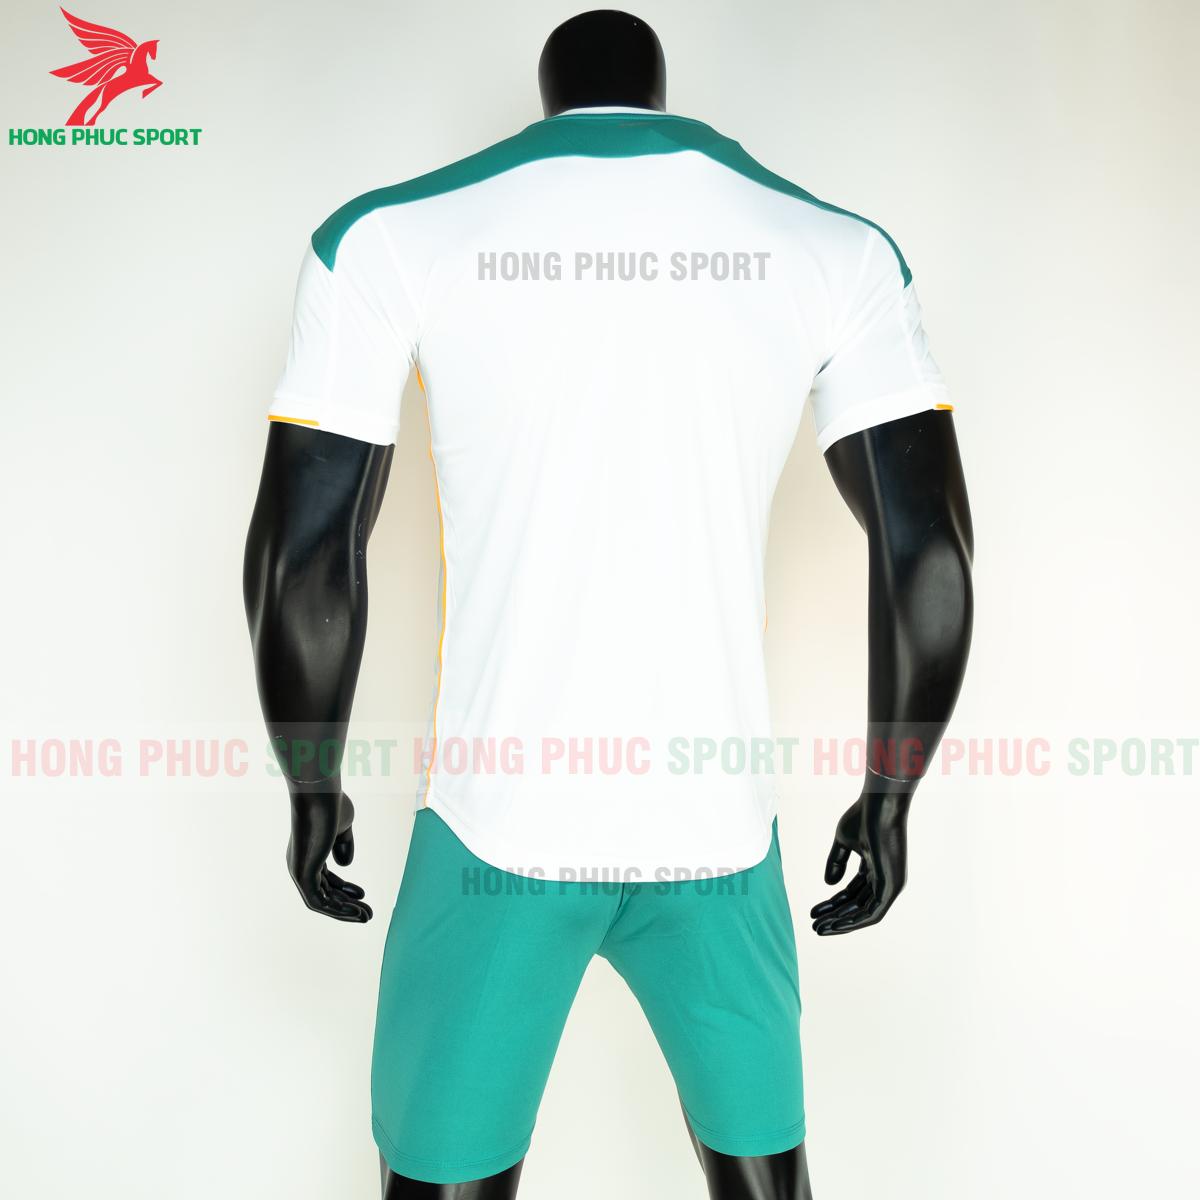 https://cdn.hongphucsport.com/unsafe/s4.shopbay.vn/files/285/ao-bong-da-khong-logo-bulbal-lotus-mau-trang-8-604f3abc1c028.png